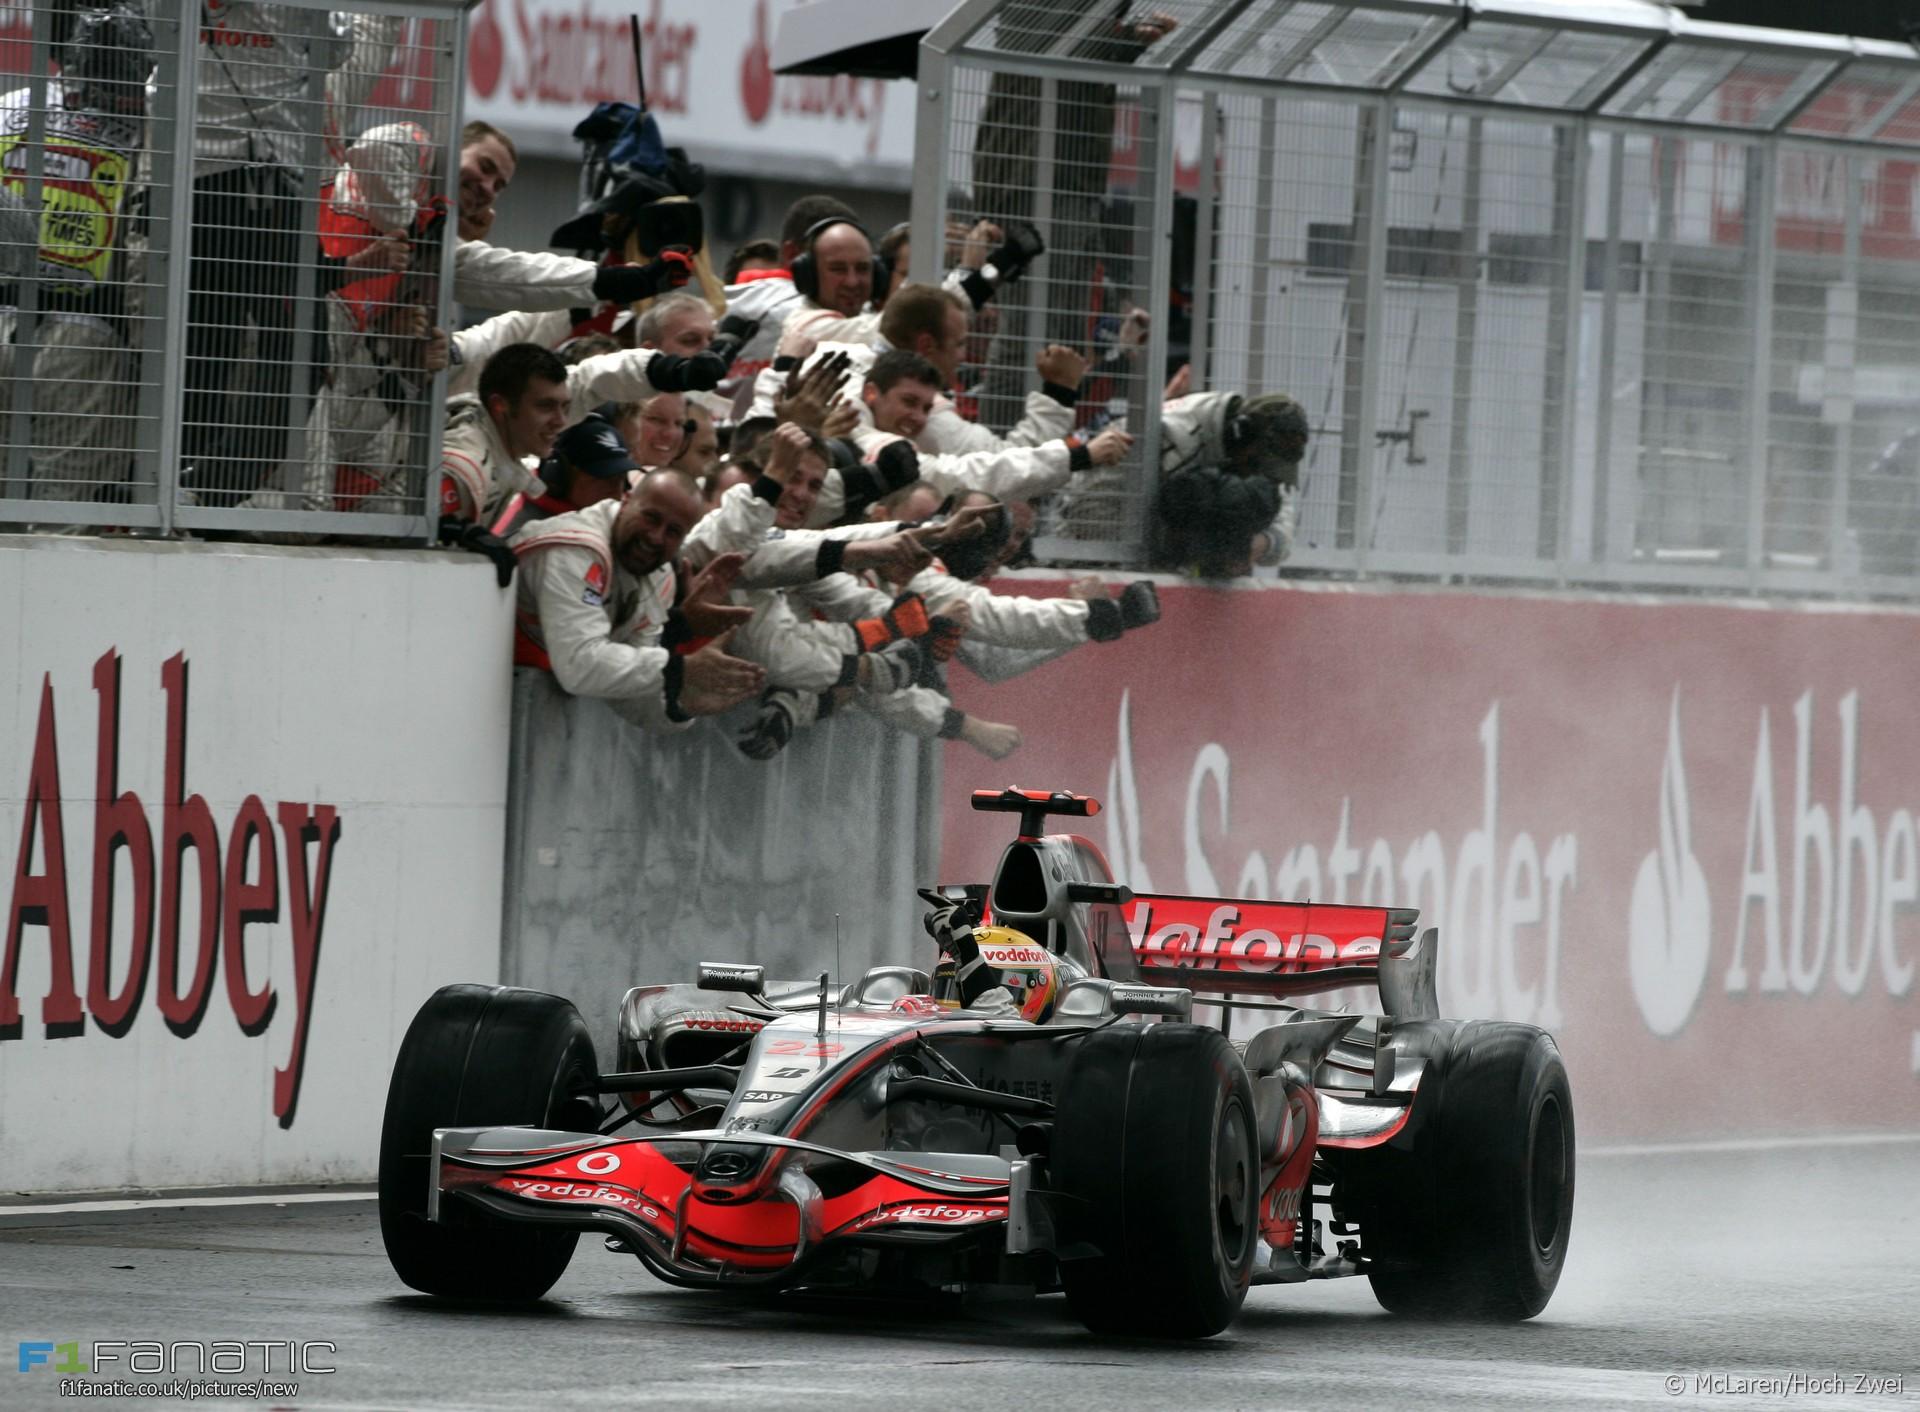 Lewis Hamilton, McLaren, Silverstone, 2008